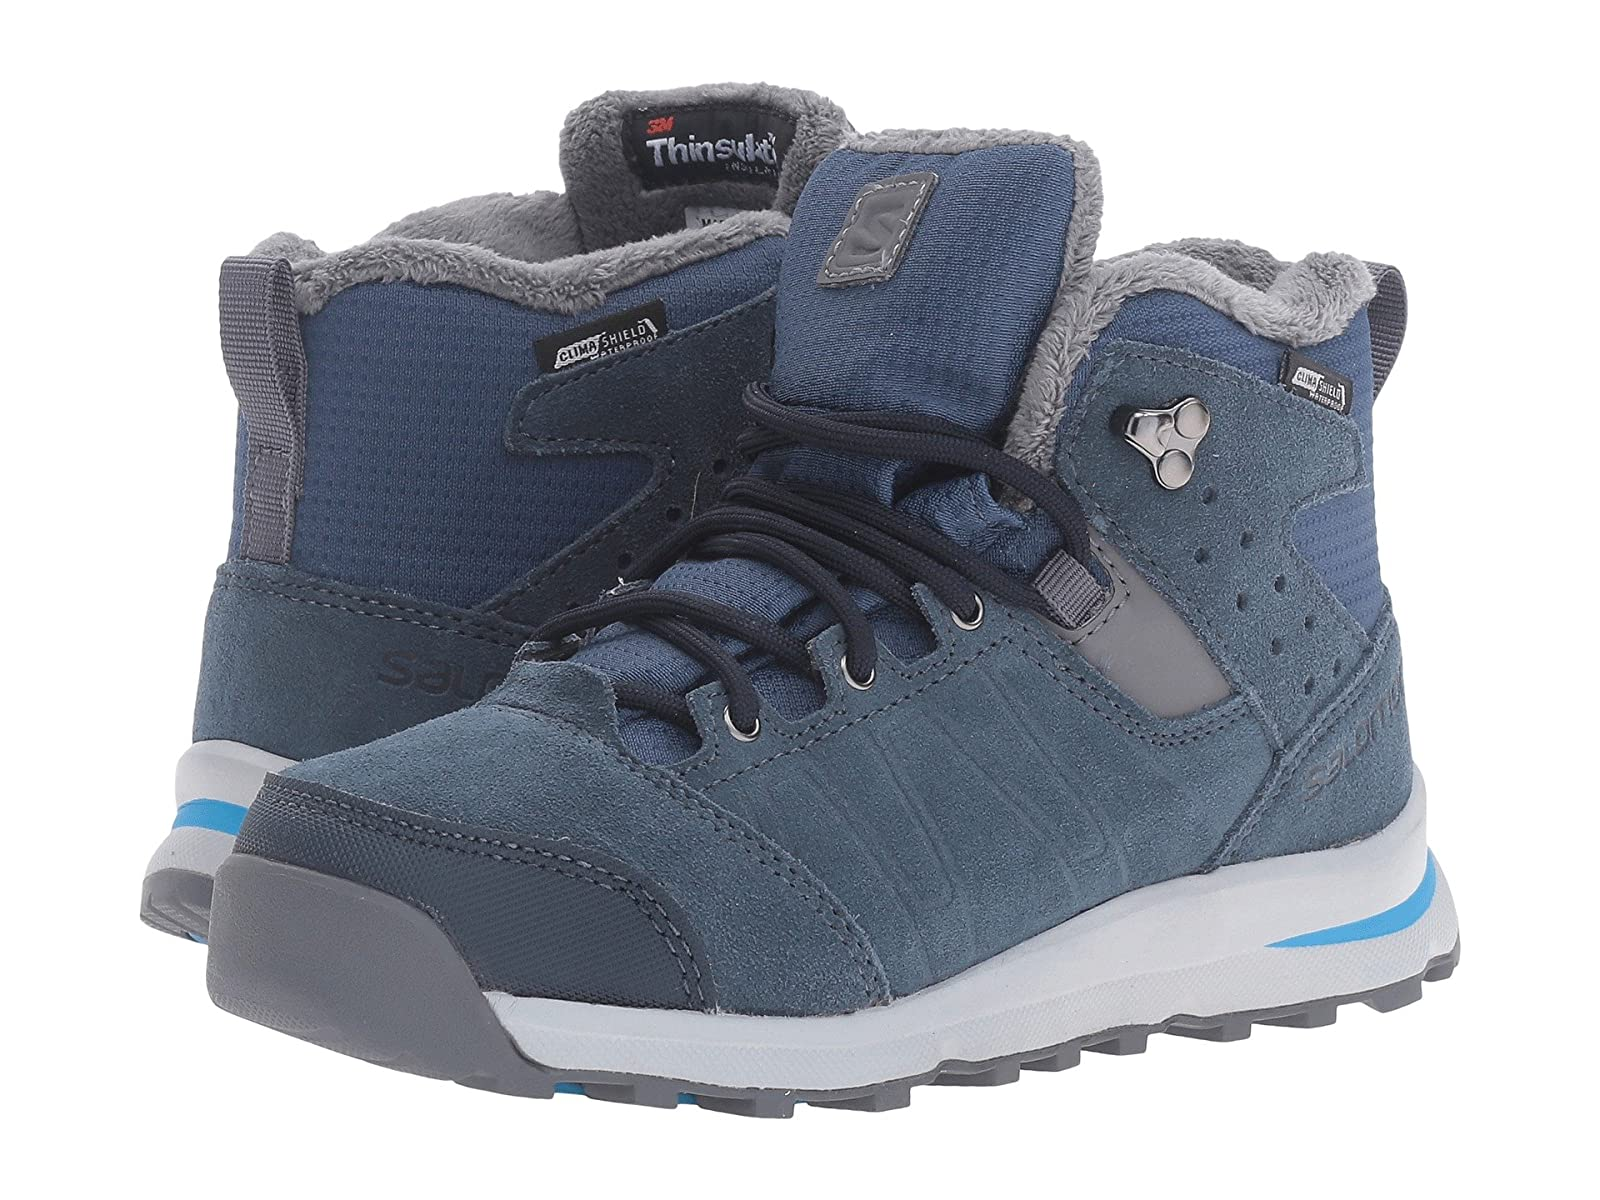 Salomon Kids Utility TS CSWP (Little Kid/Big Kid)Cheap and distinctive eye-catching shoes